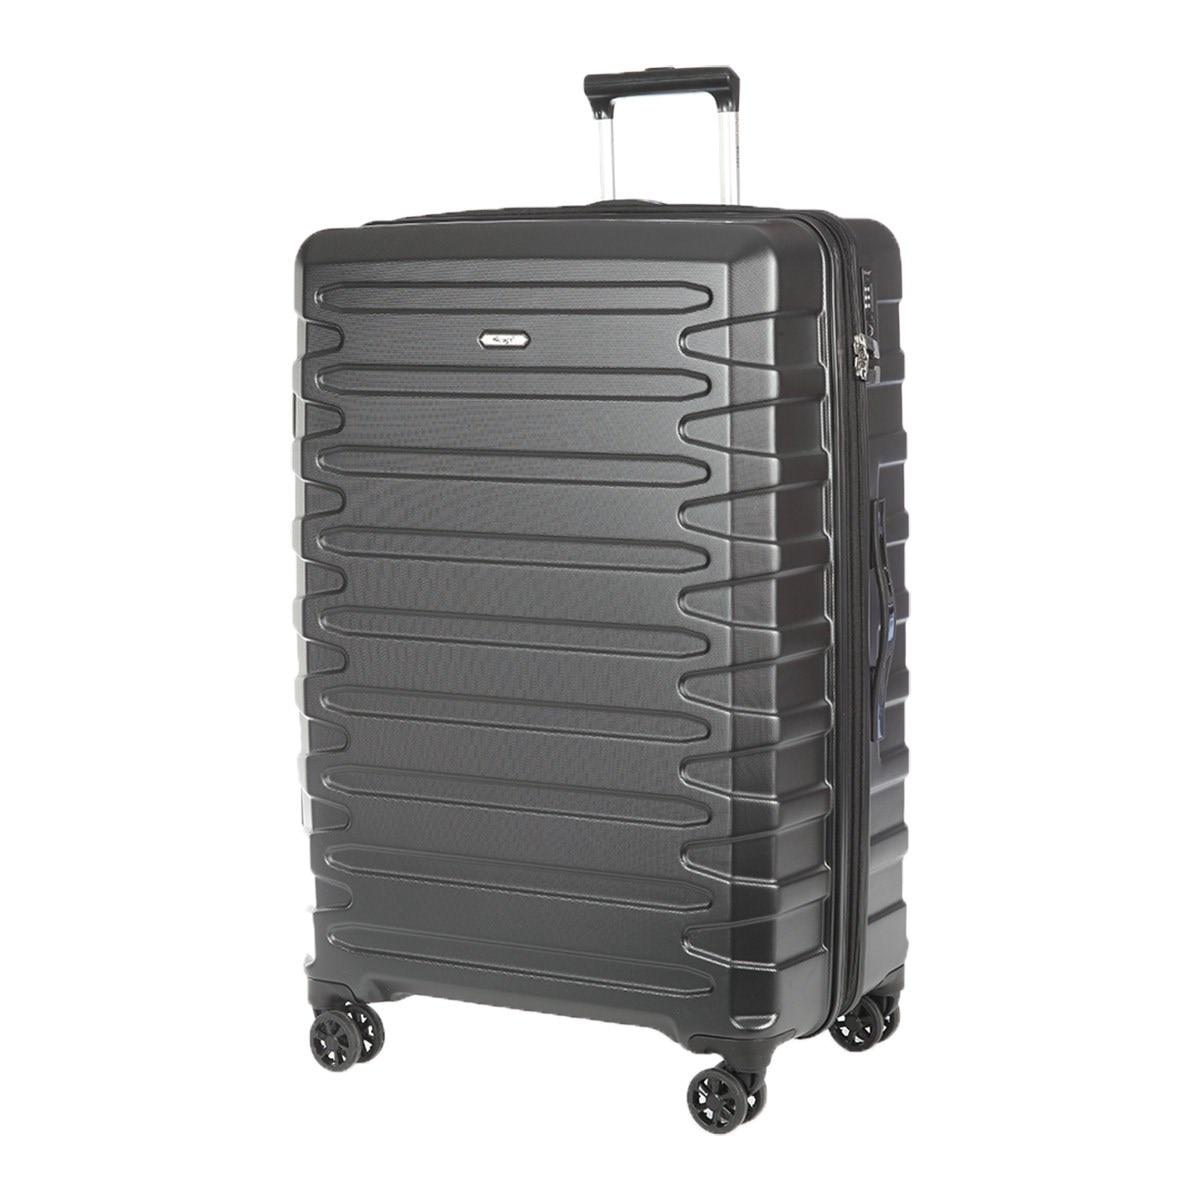 Suitcase-trolley Verage GM17106W29 black